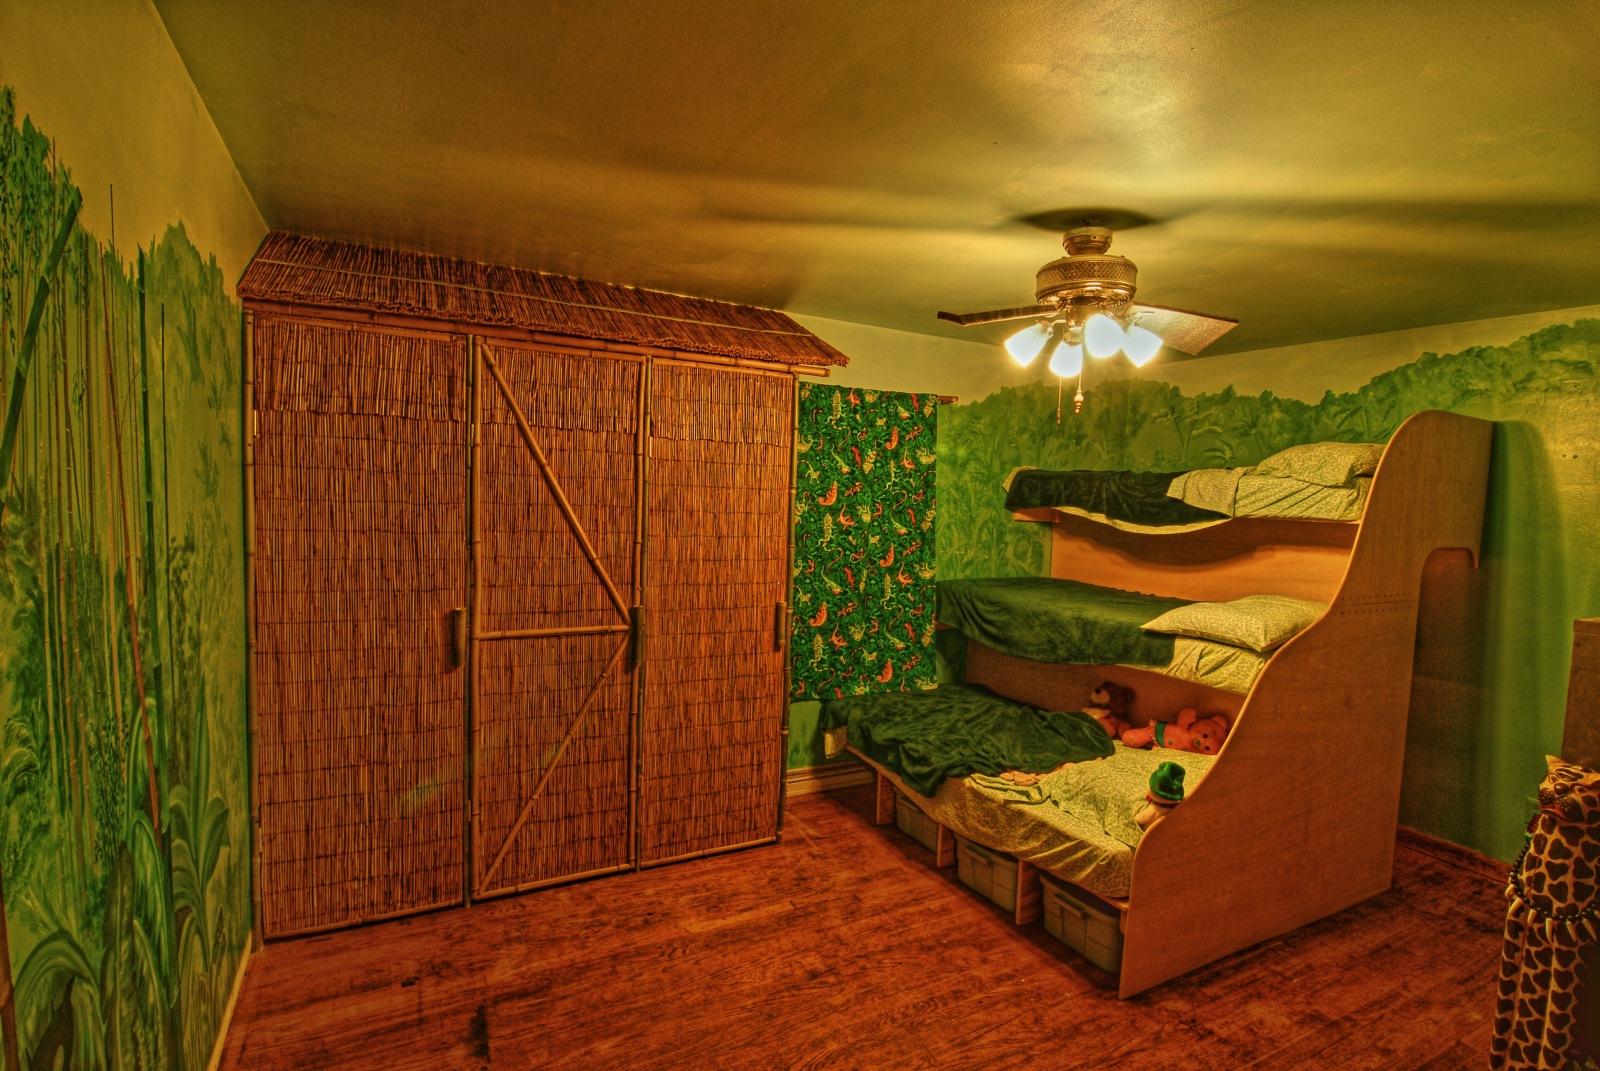 Rainforest Wallpaper For A Room Wallpapersafari